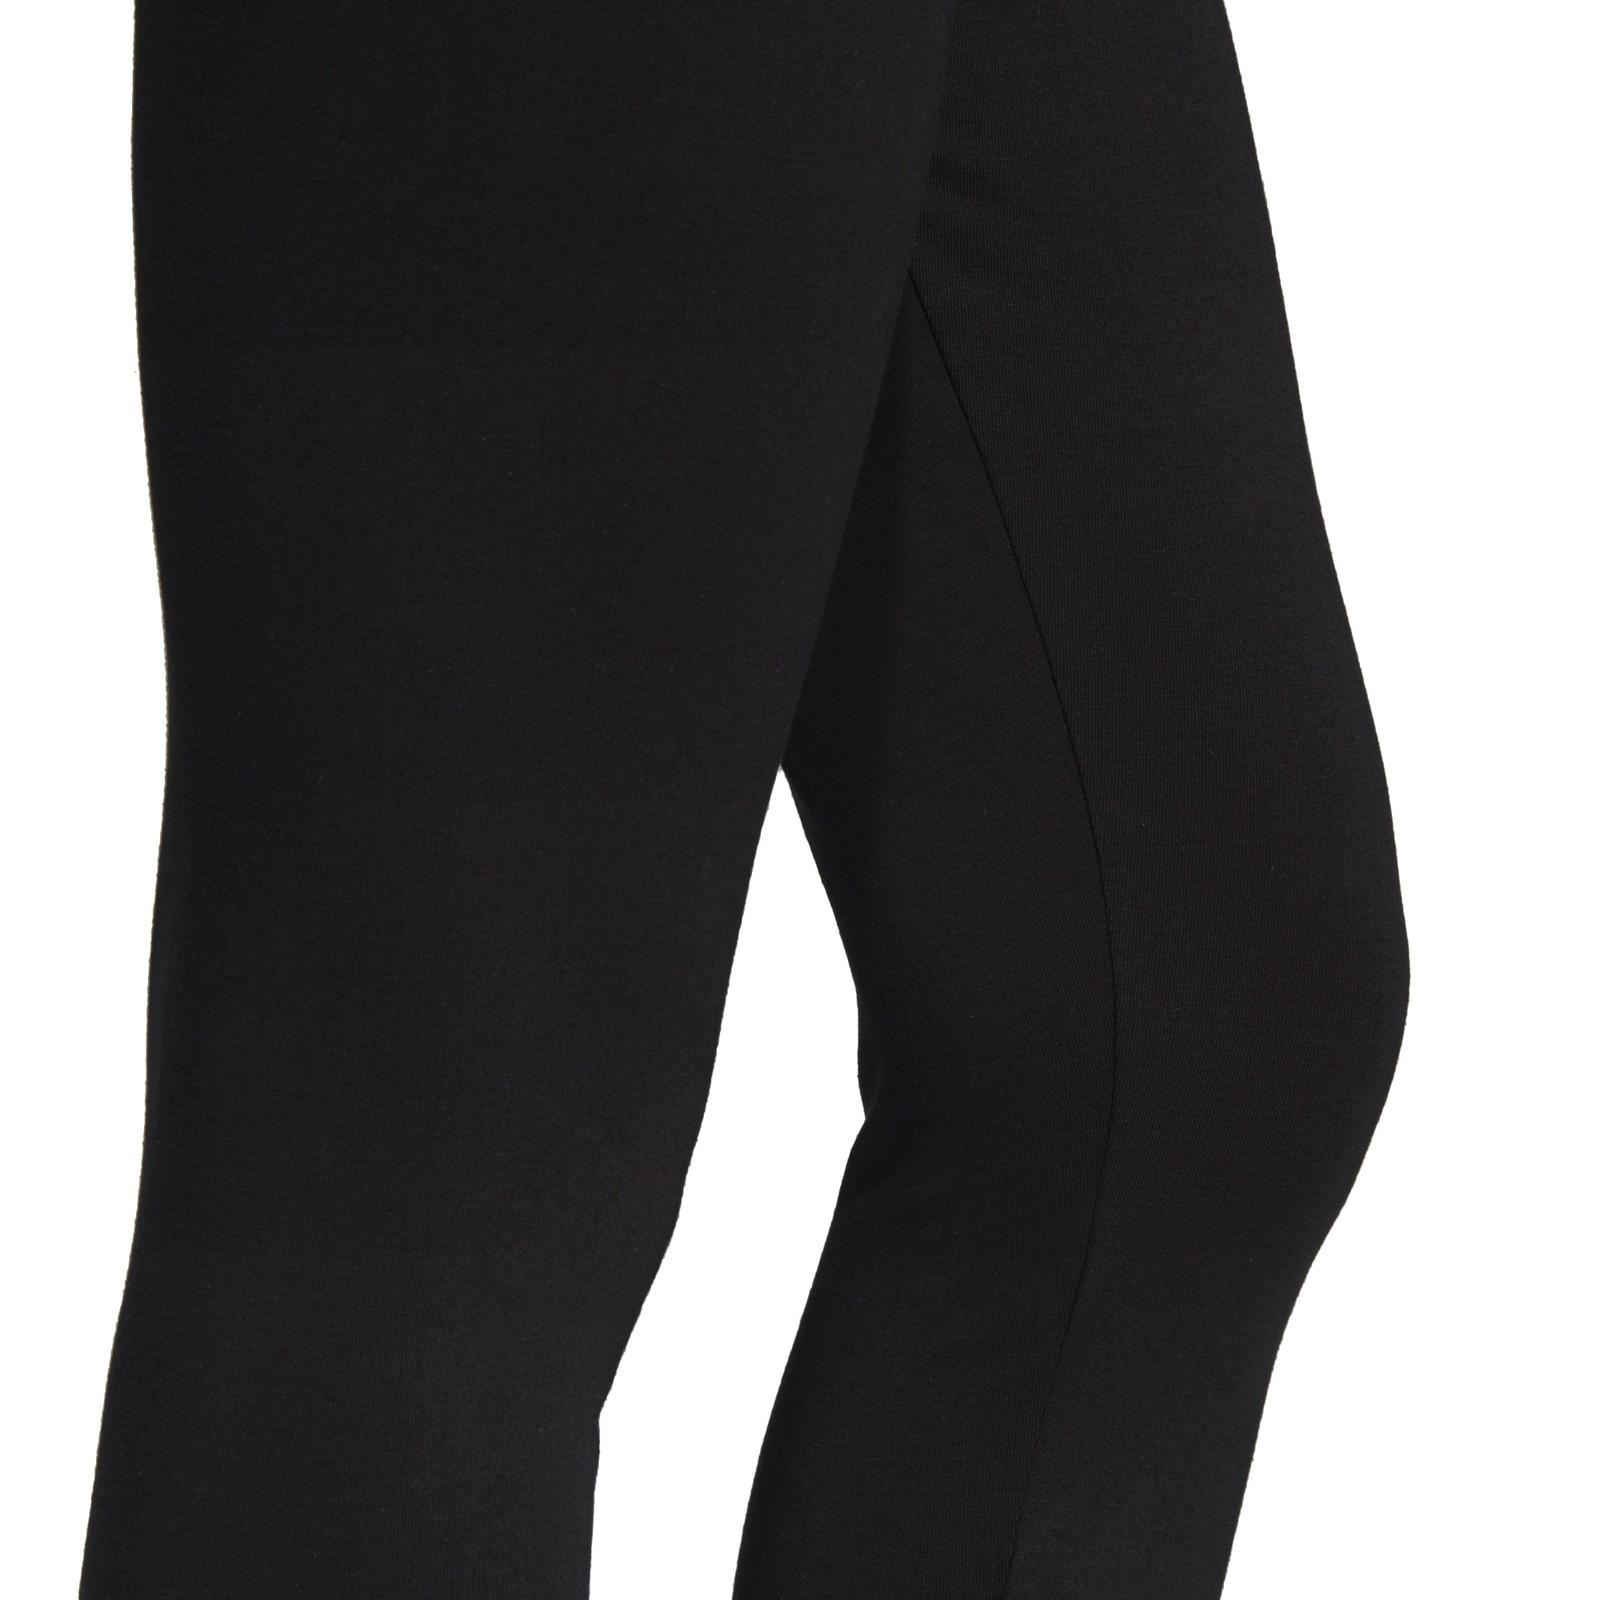 ADIDAS ESSENTIALS LINEAR Tight Leggings Damen Sporthose